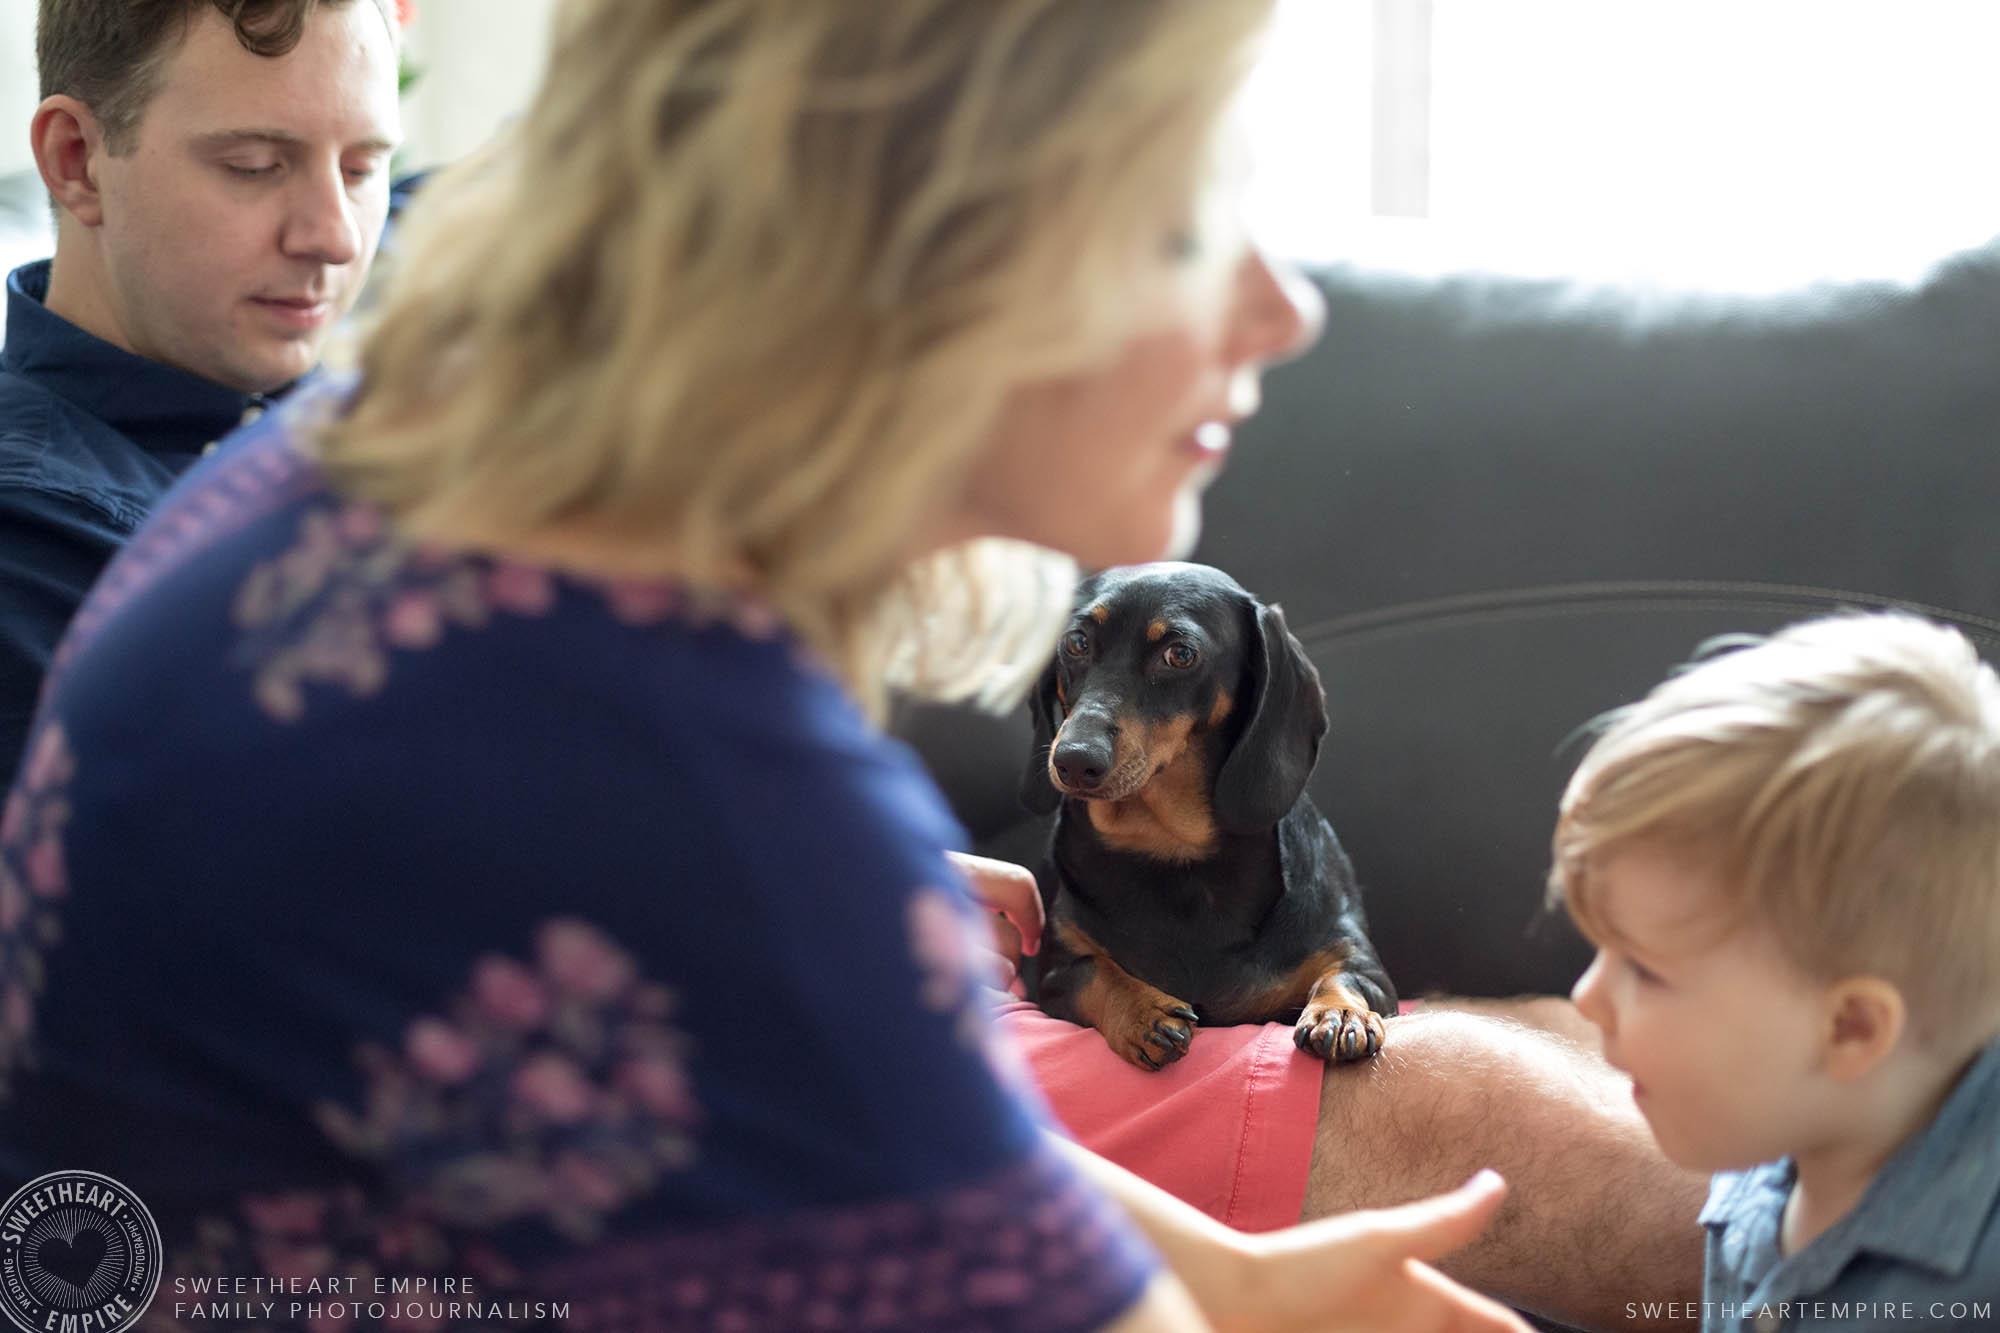 19_Miniature dachshun looks on while mom picks up son.jpg